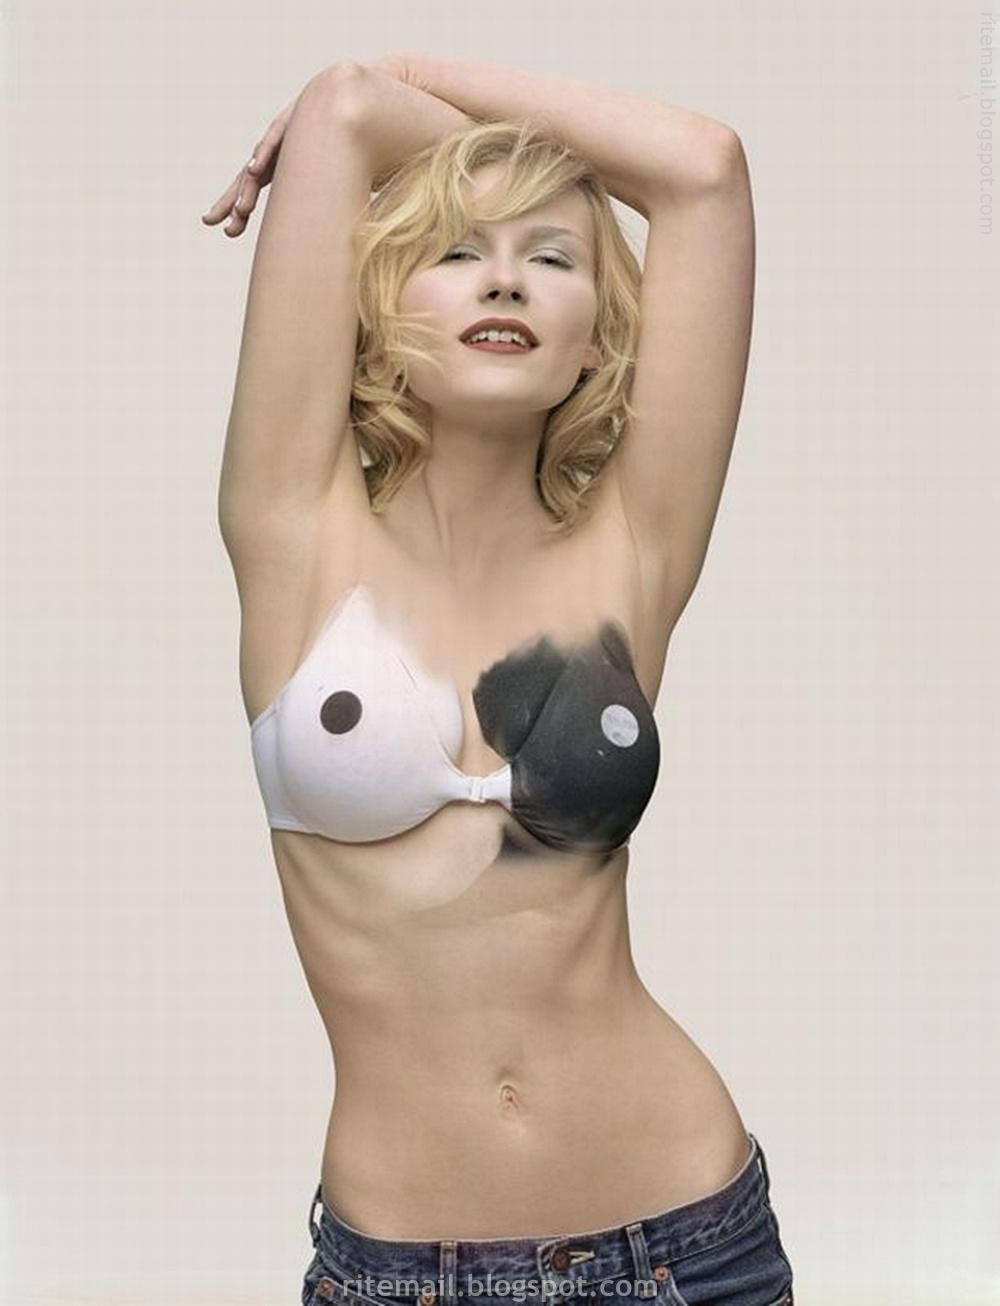 Kirsten Dunst New Look - Ye Kya Chutiyapa Hai